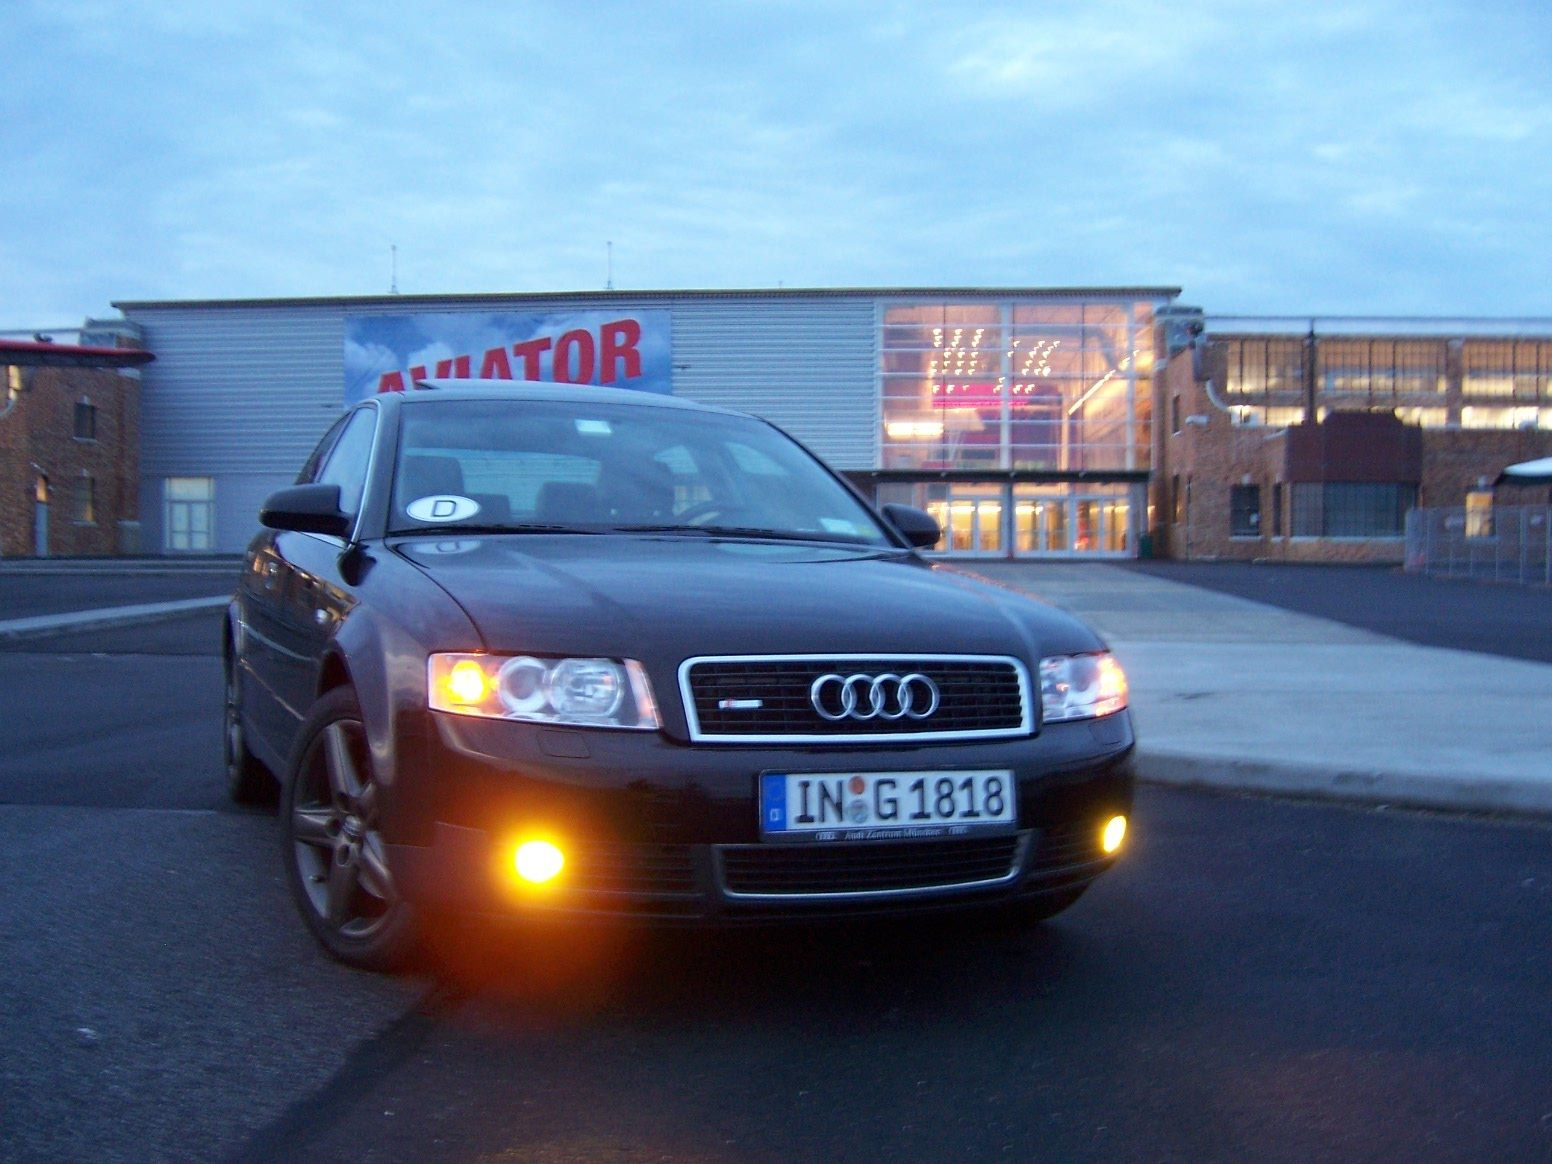 2002 To 2005 Audi A4 B6 Sedan Real World Vehicle Review Audi A4 Vehicles Audi